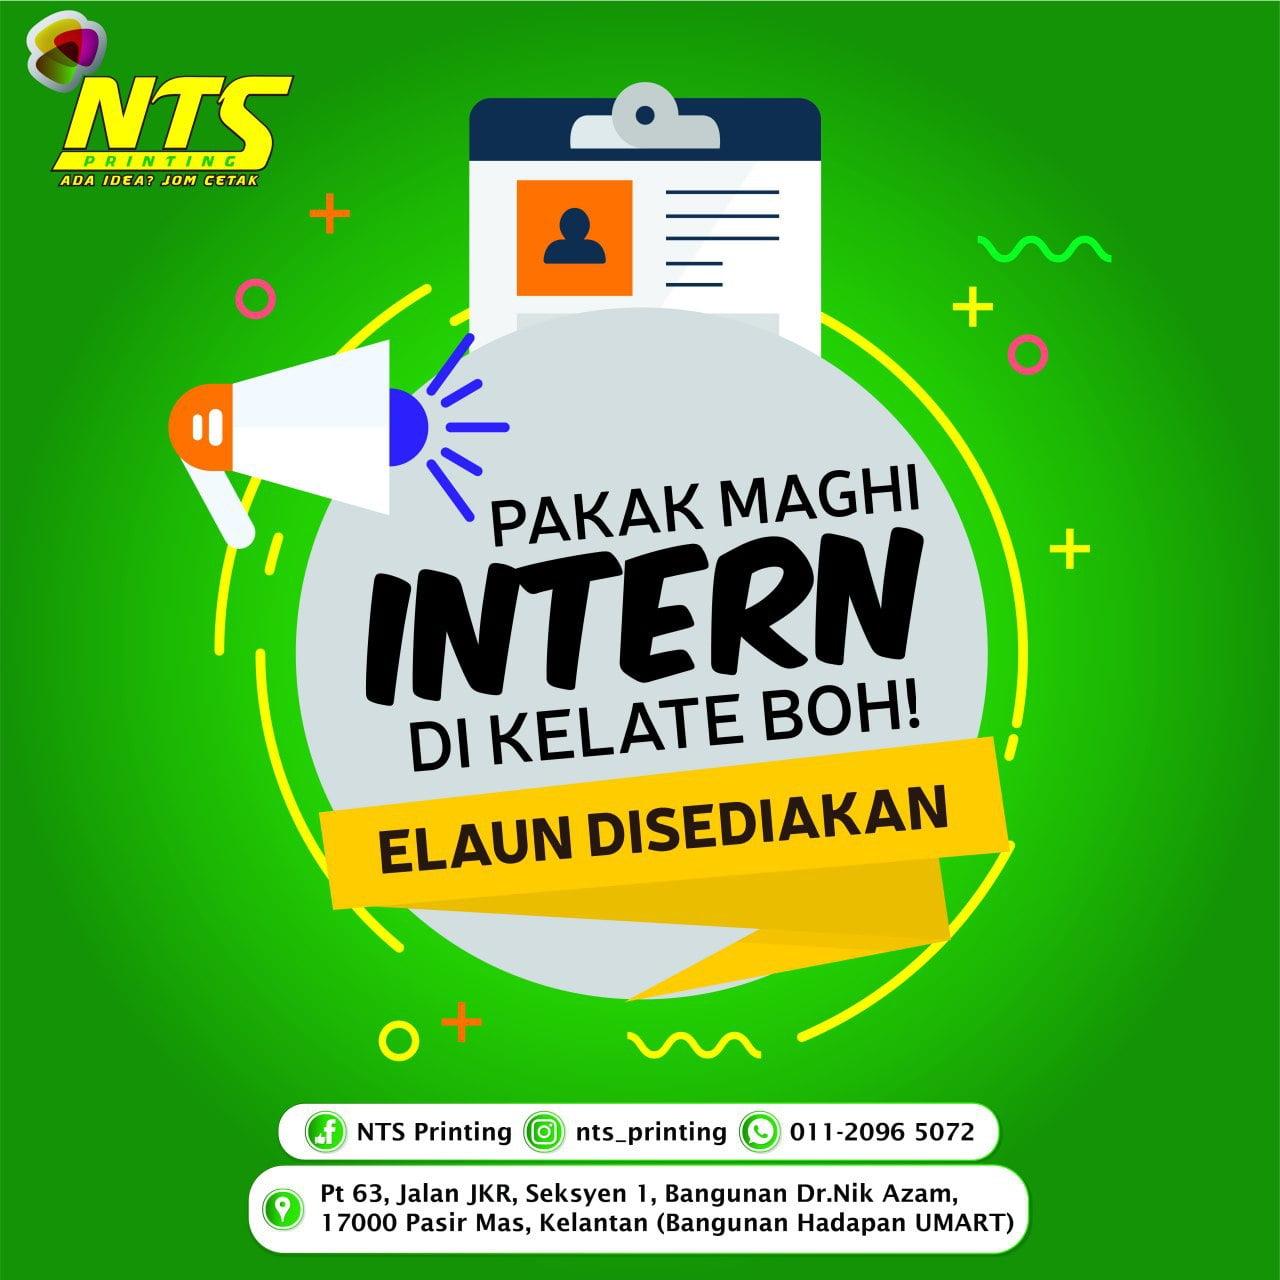 Peluang Praktikal Di NTS Printing ( Pasir Mas)